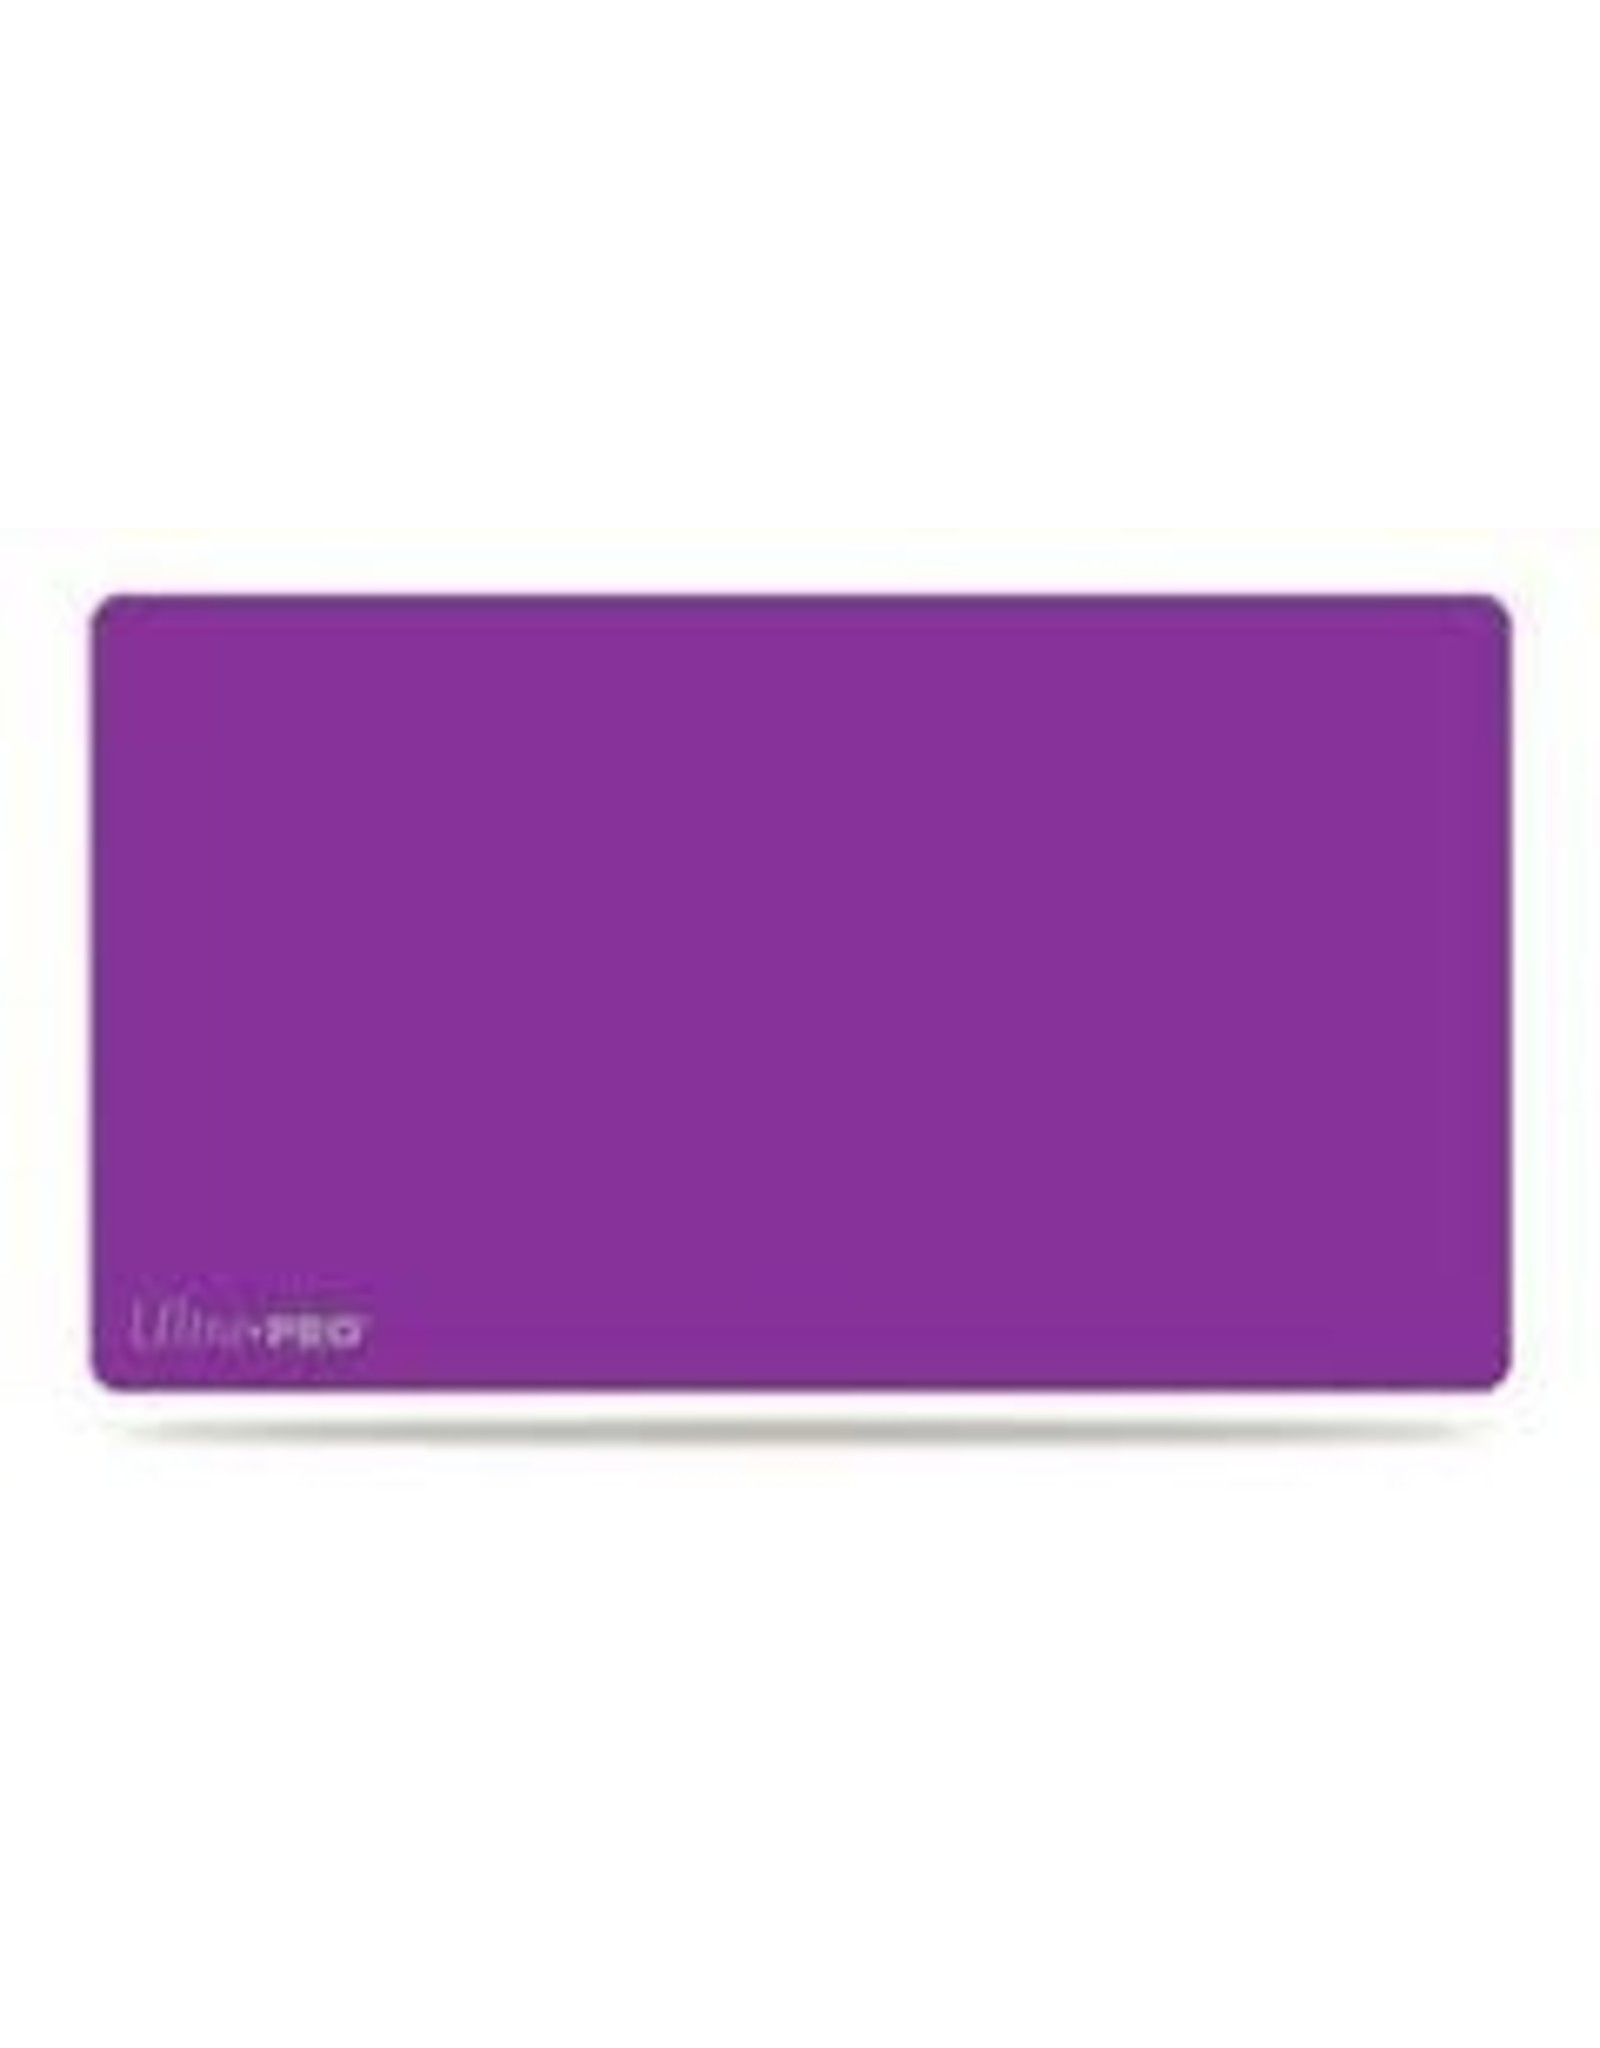 Ultra Pro Ultra Pro Artist Playmat: Solid Purple